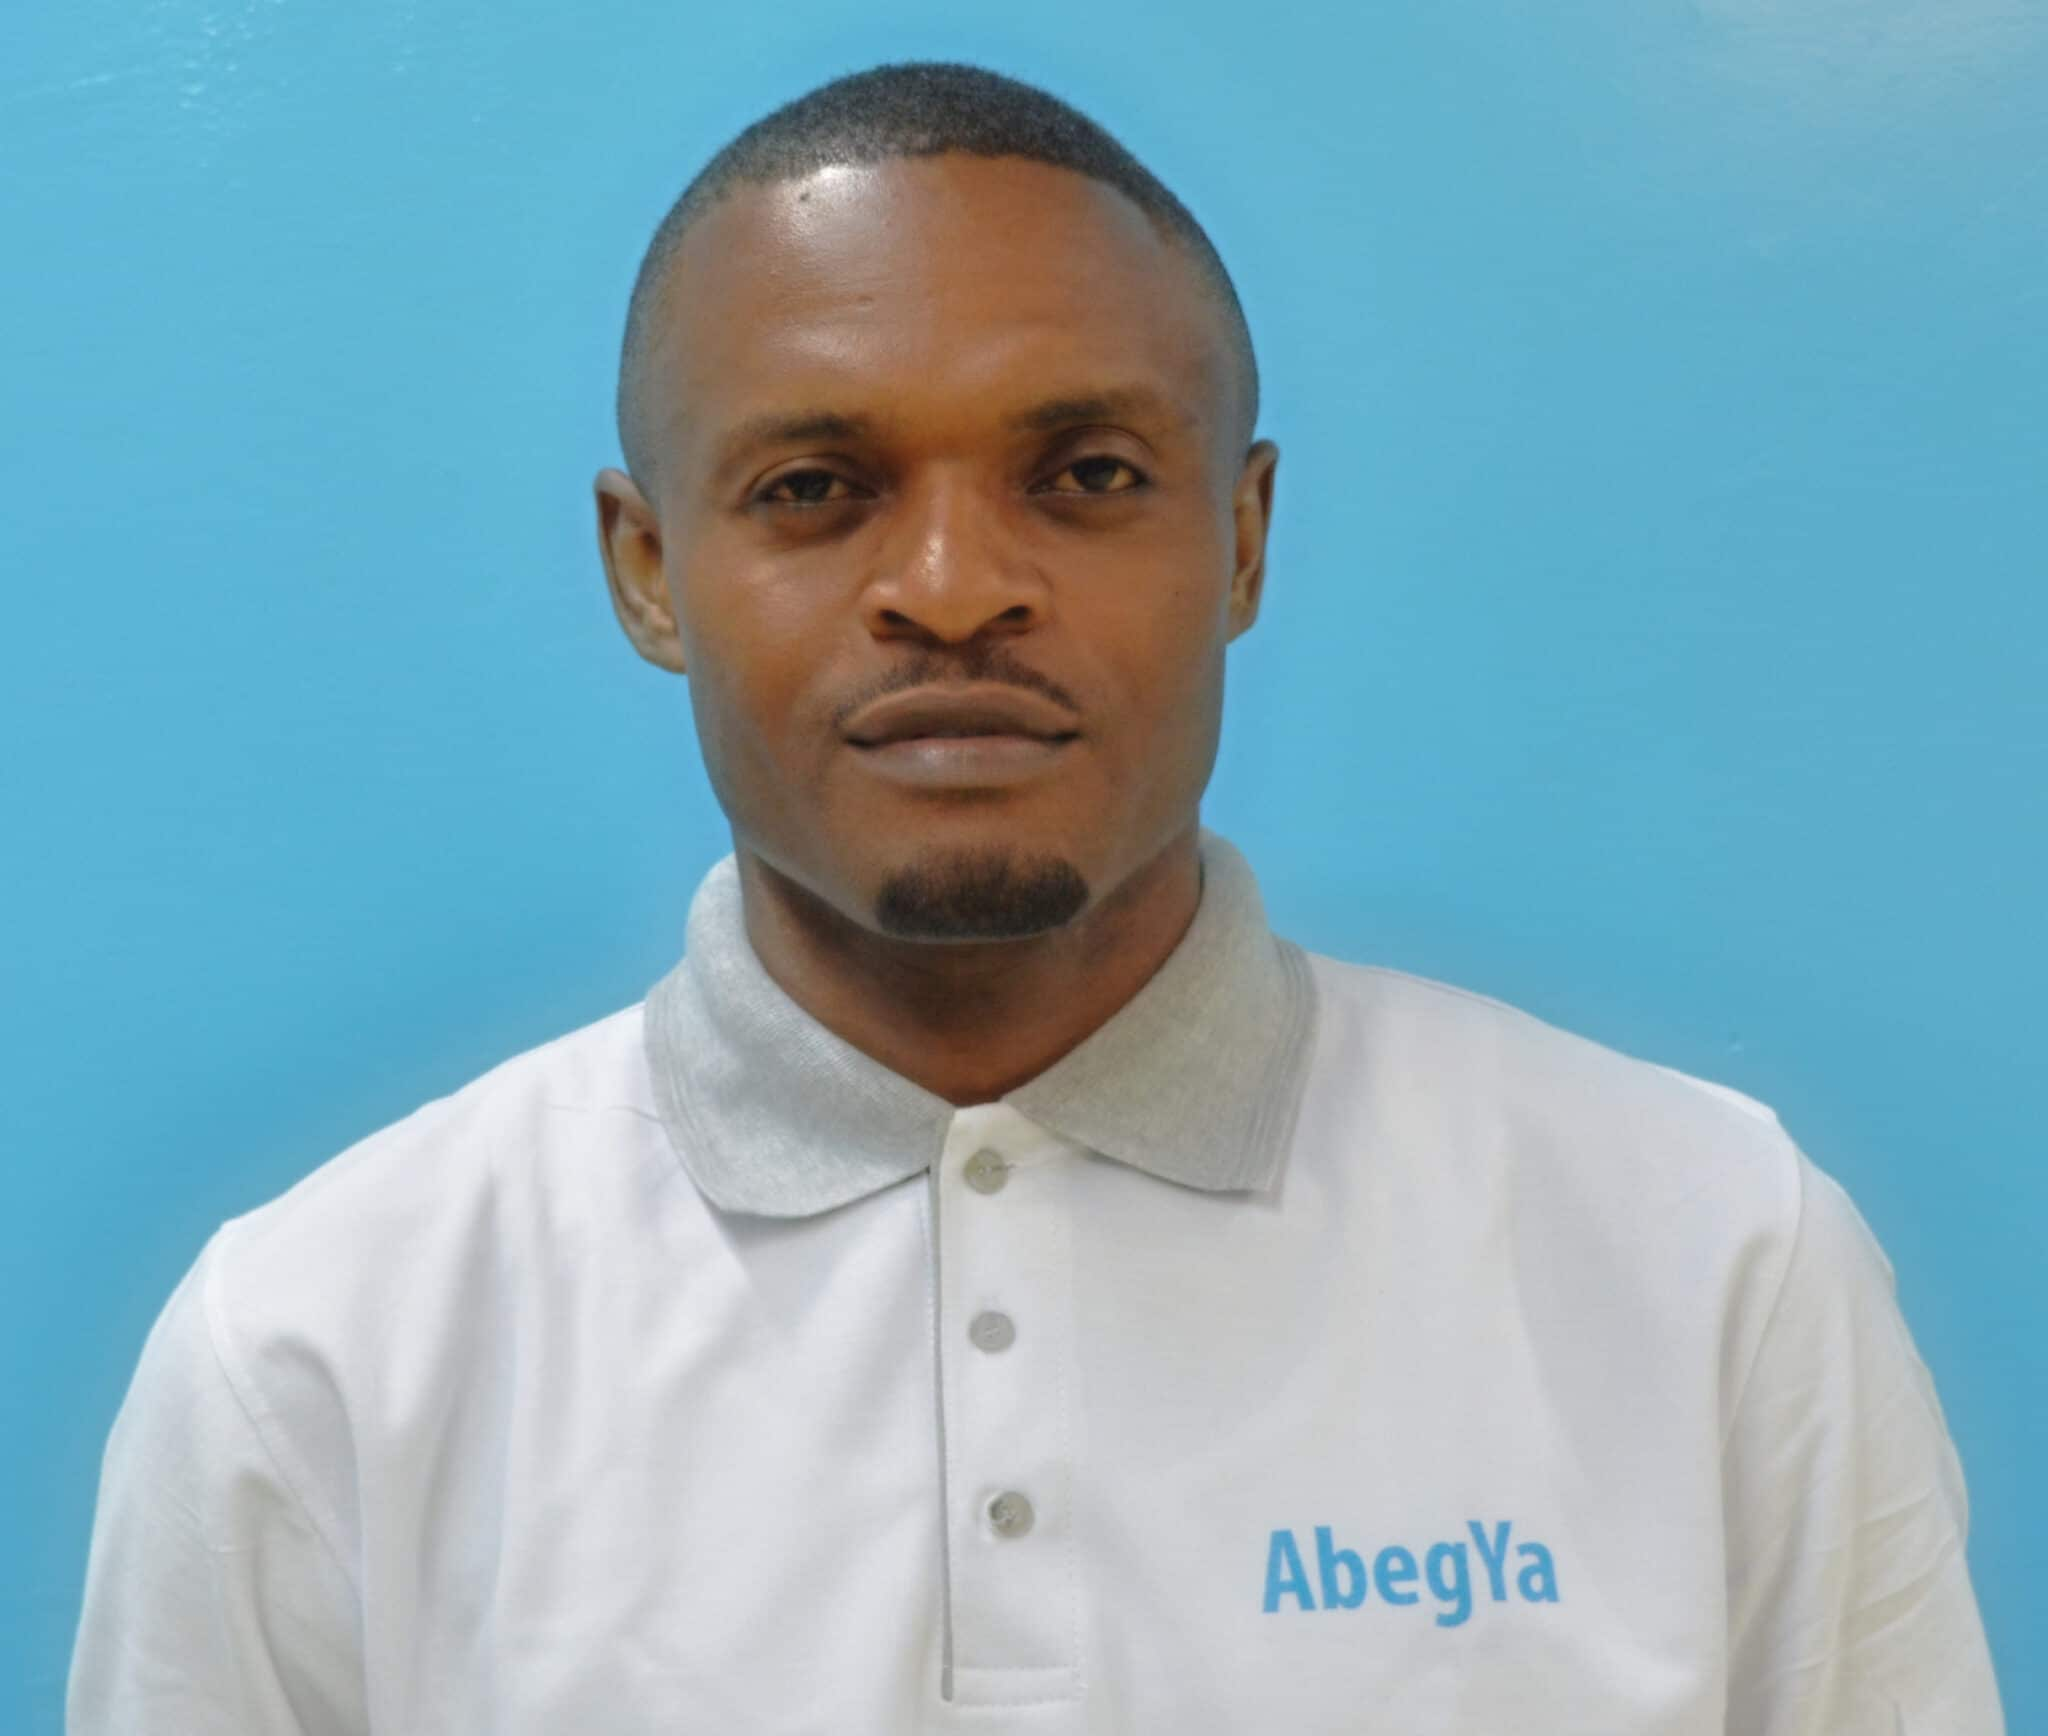 Gilbert Mbeh AbegYa